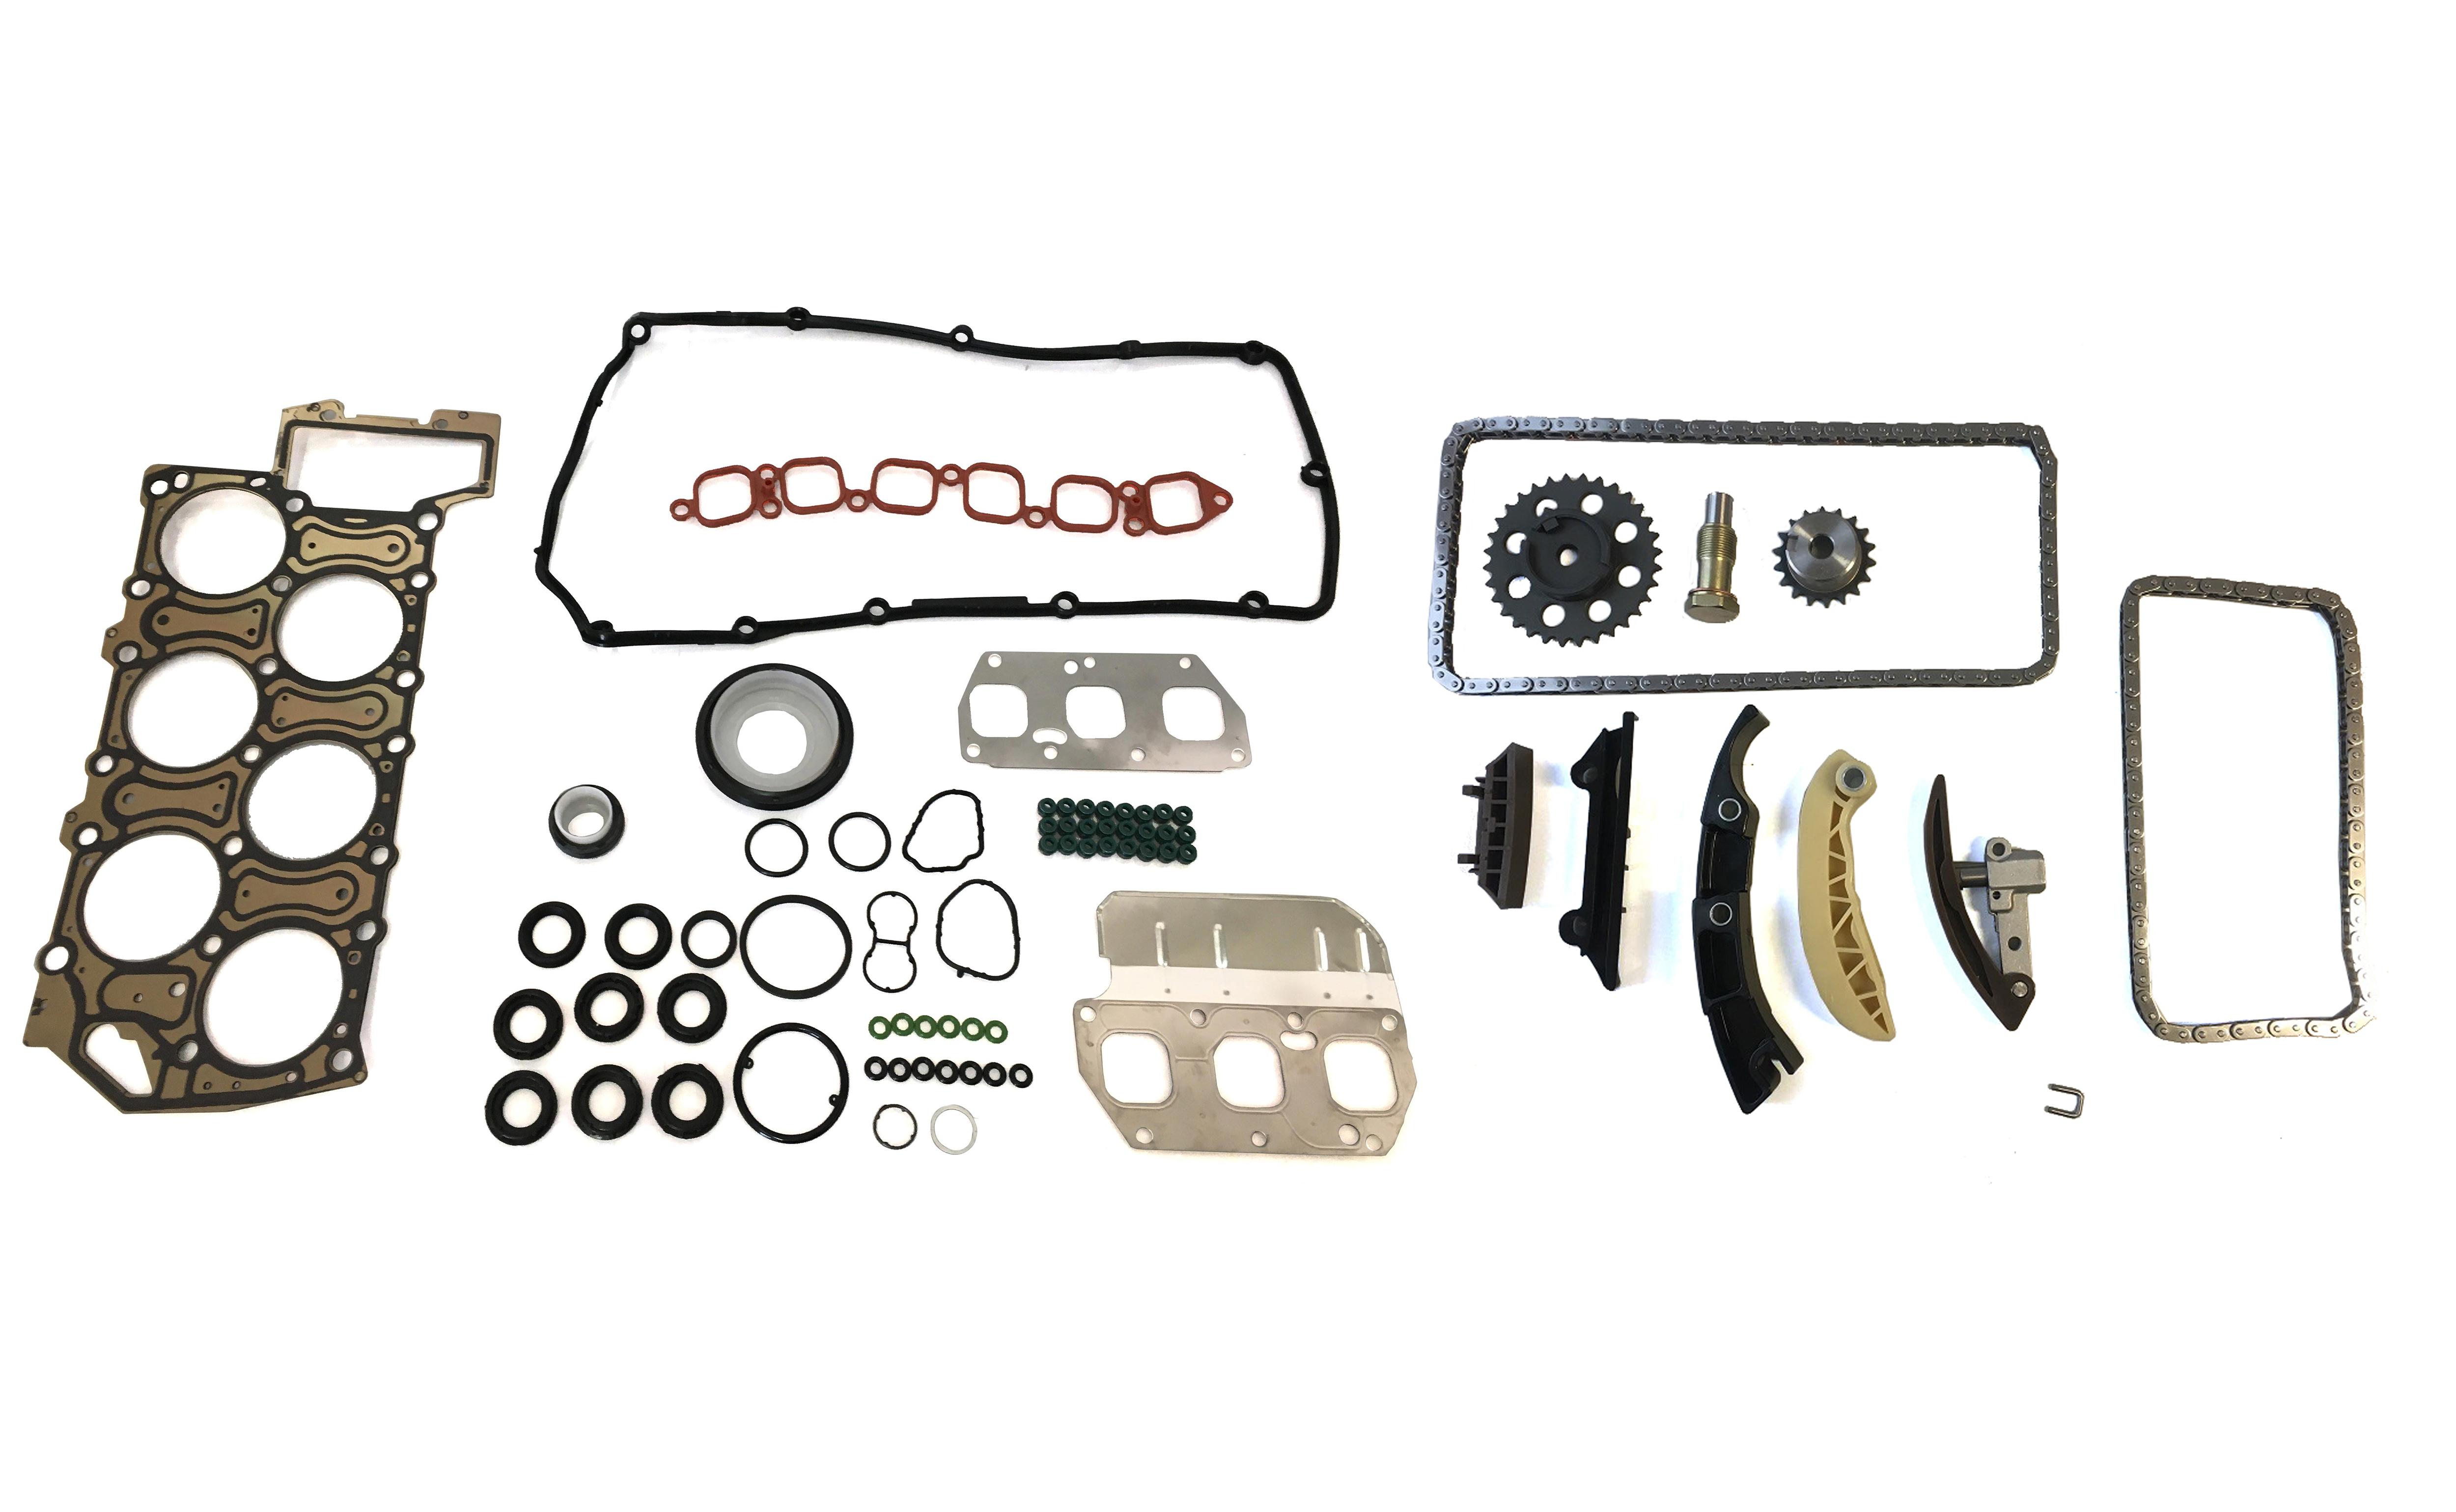 Komplettsatz Dichtungssatz Kettensatz VW 3,2 V6 BKK BJS BKJ NEU